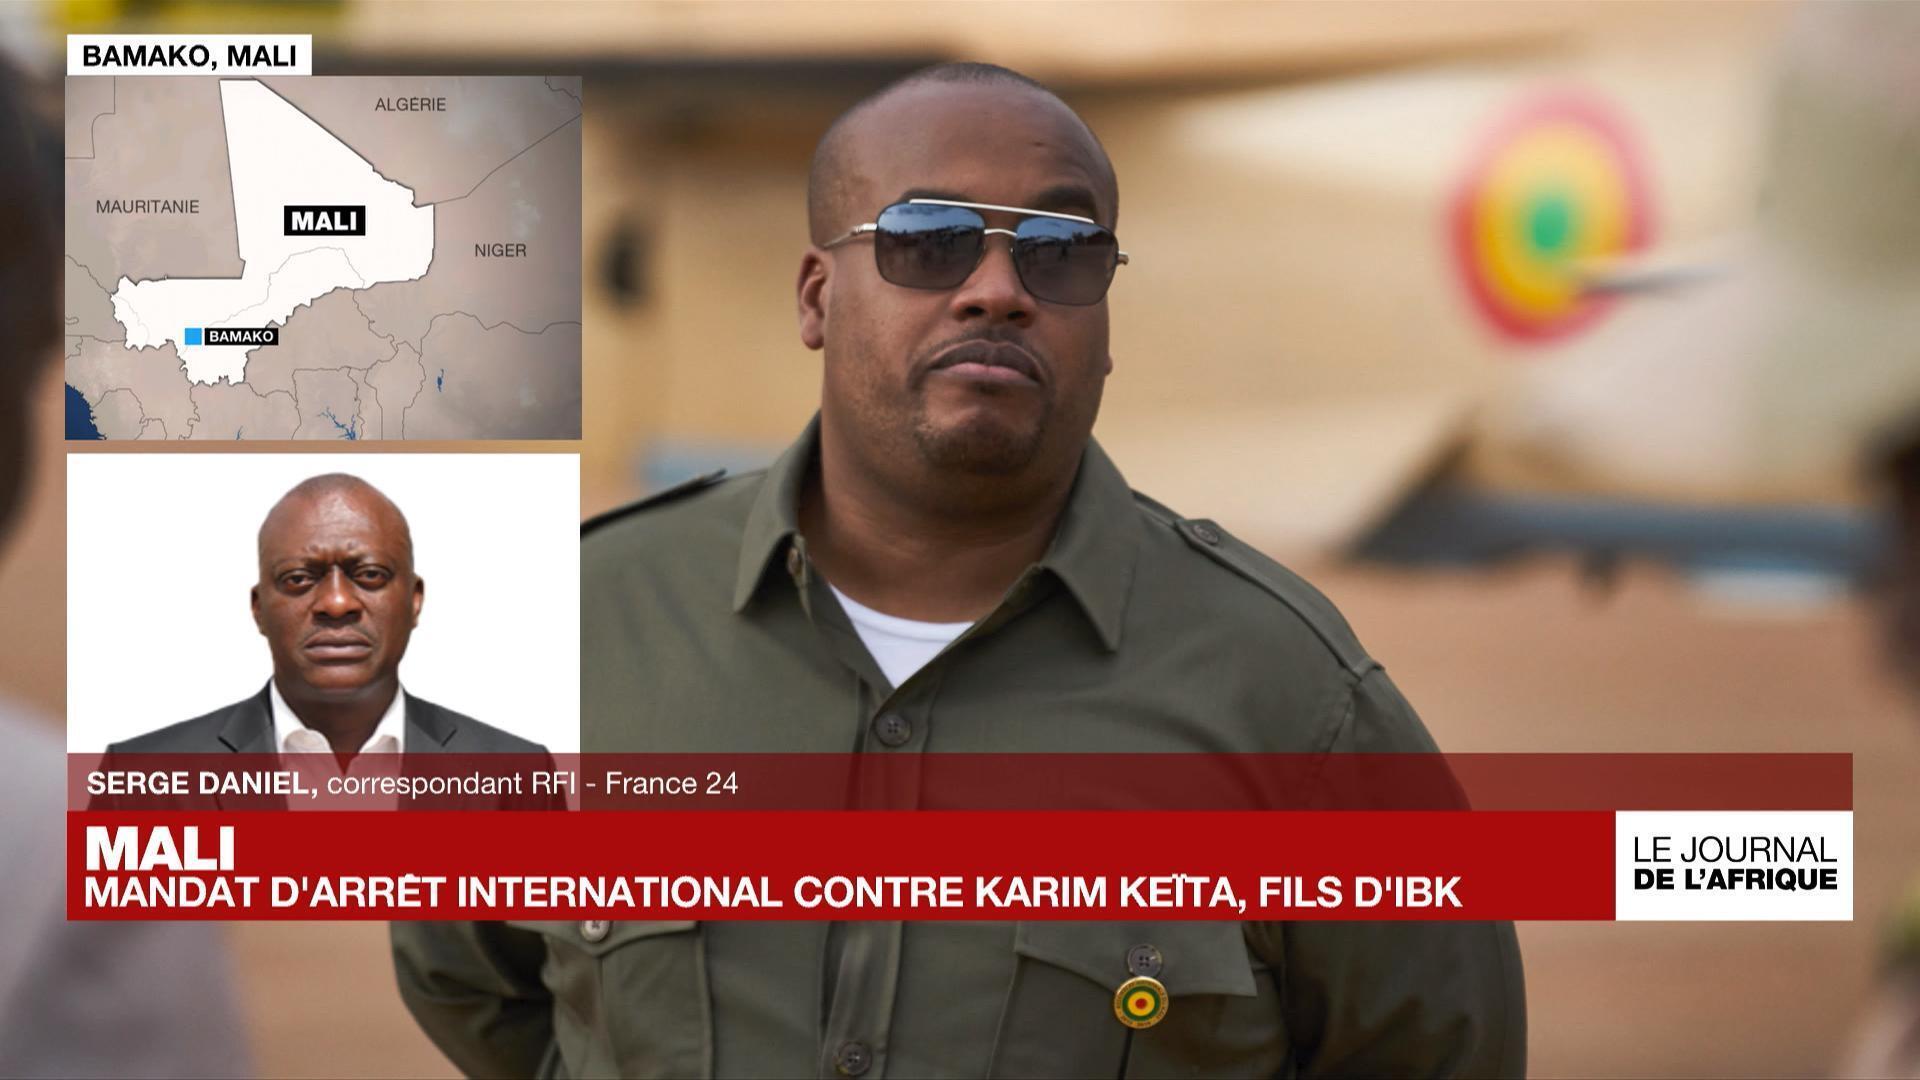 Mali : mandat d'arrêt international contre Karim Keïta, fils de l'ex-président Ibrahim Boubacar Keïta